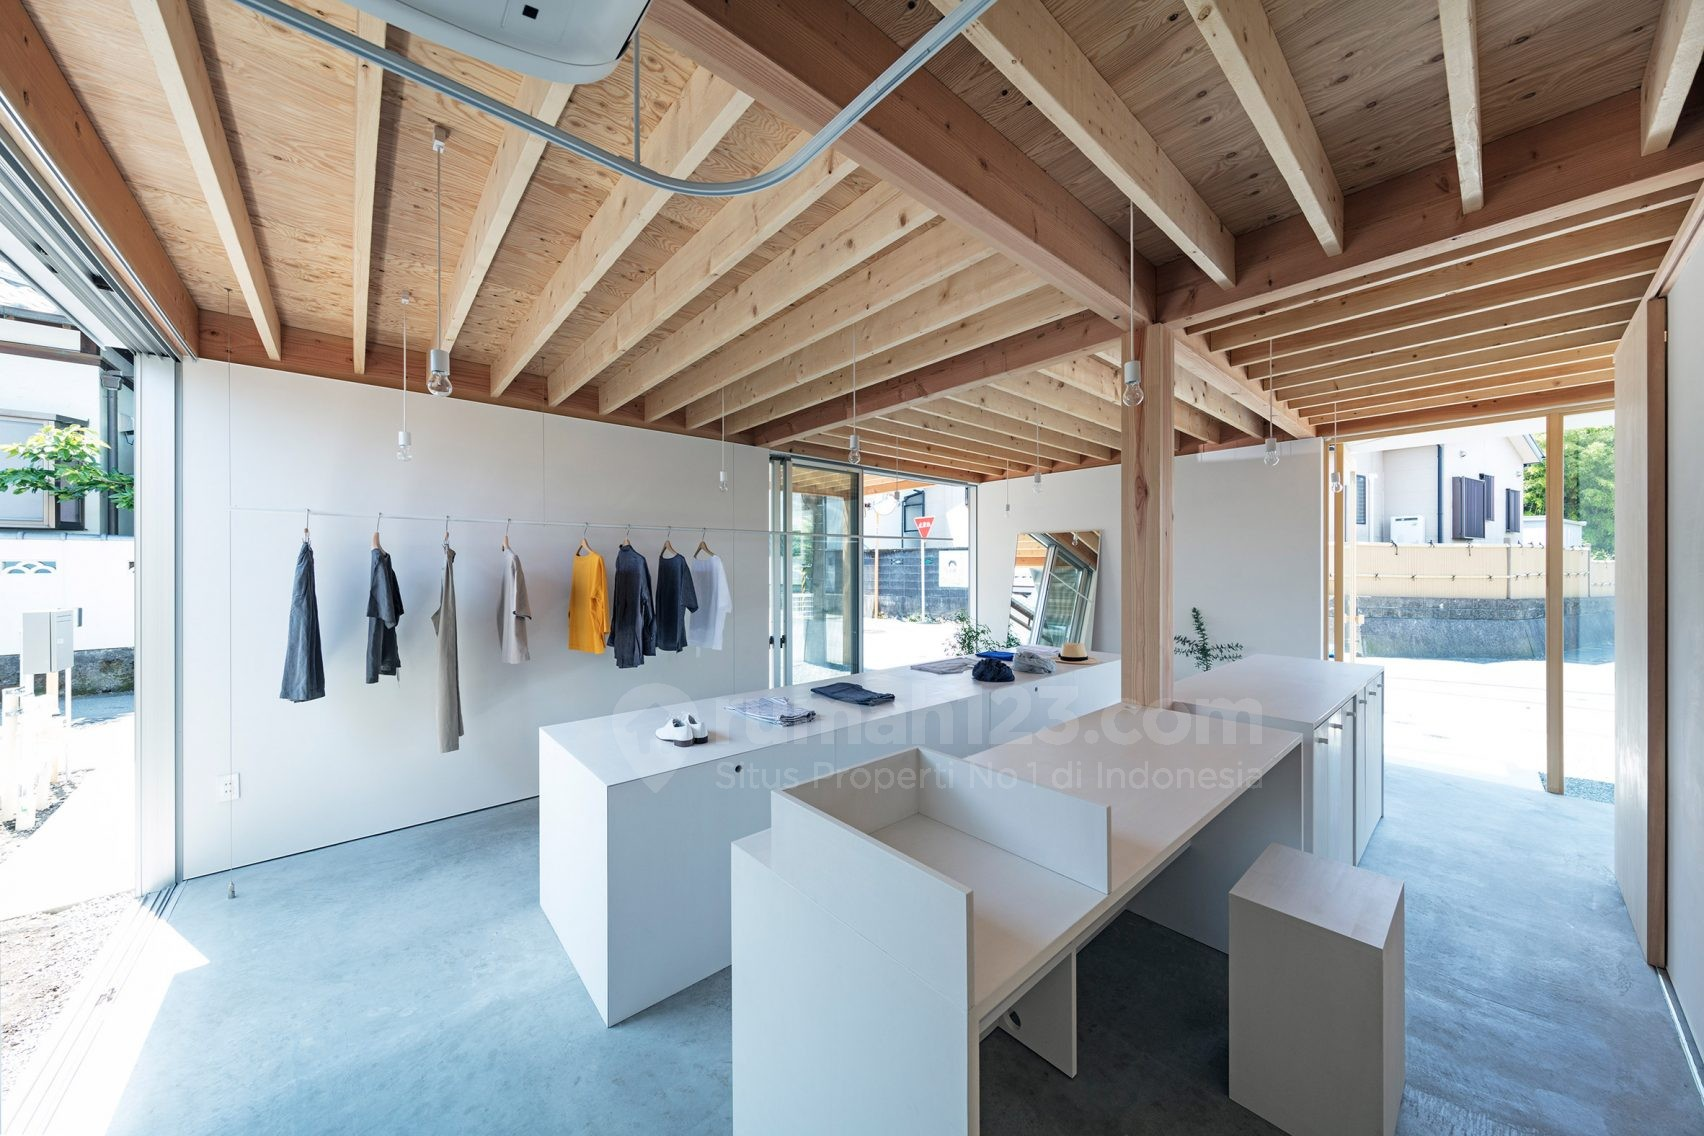 Butik Dengan Konsep Minimalis Dan Terbuka Rumah123 Com